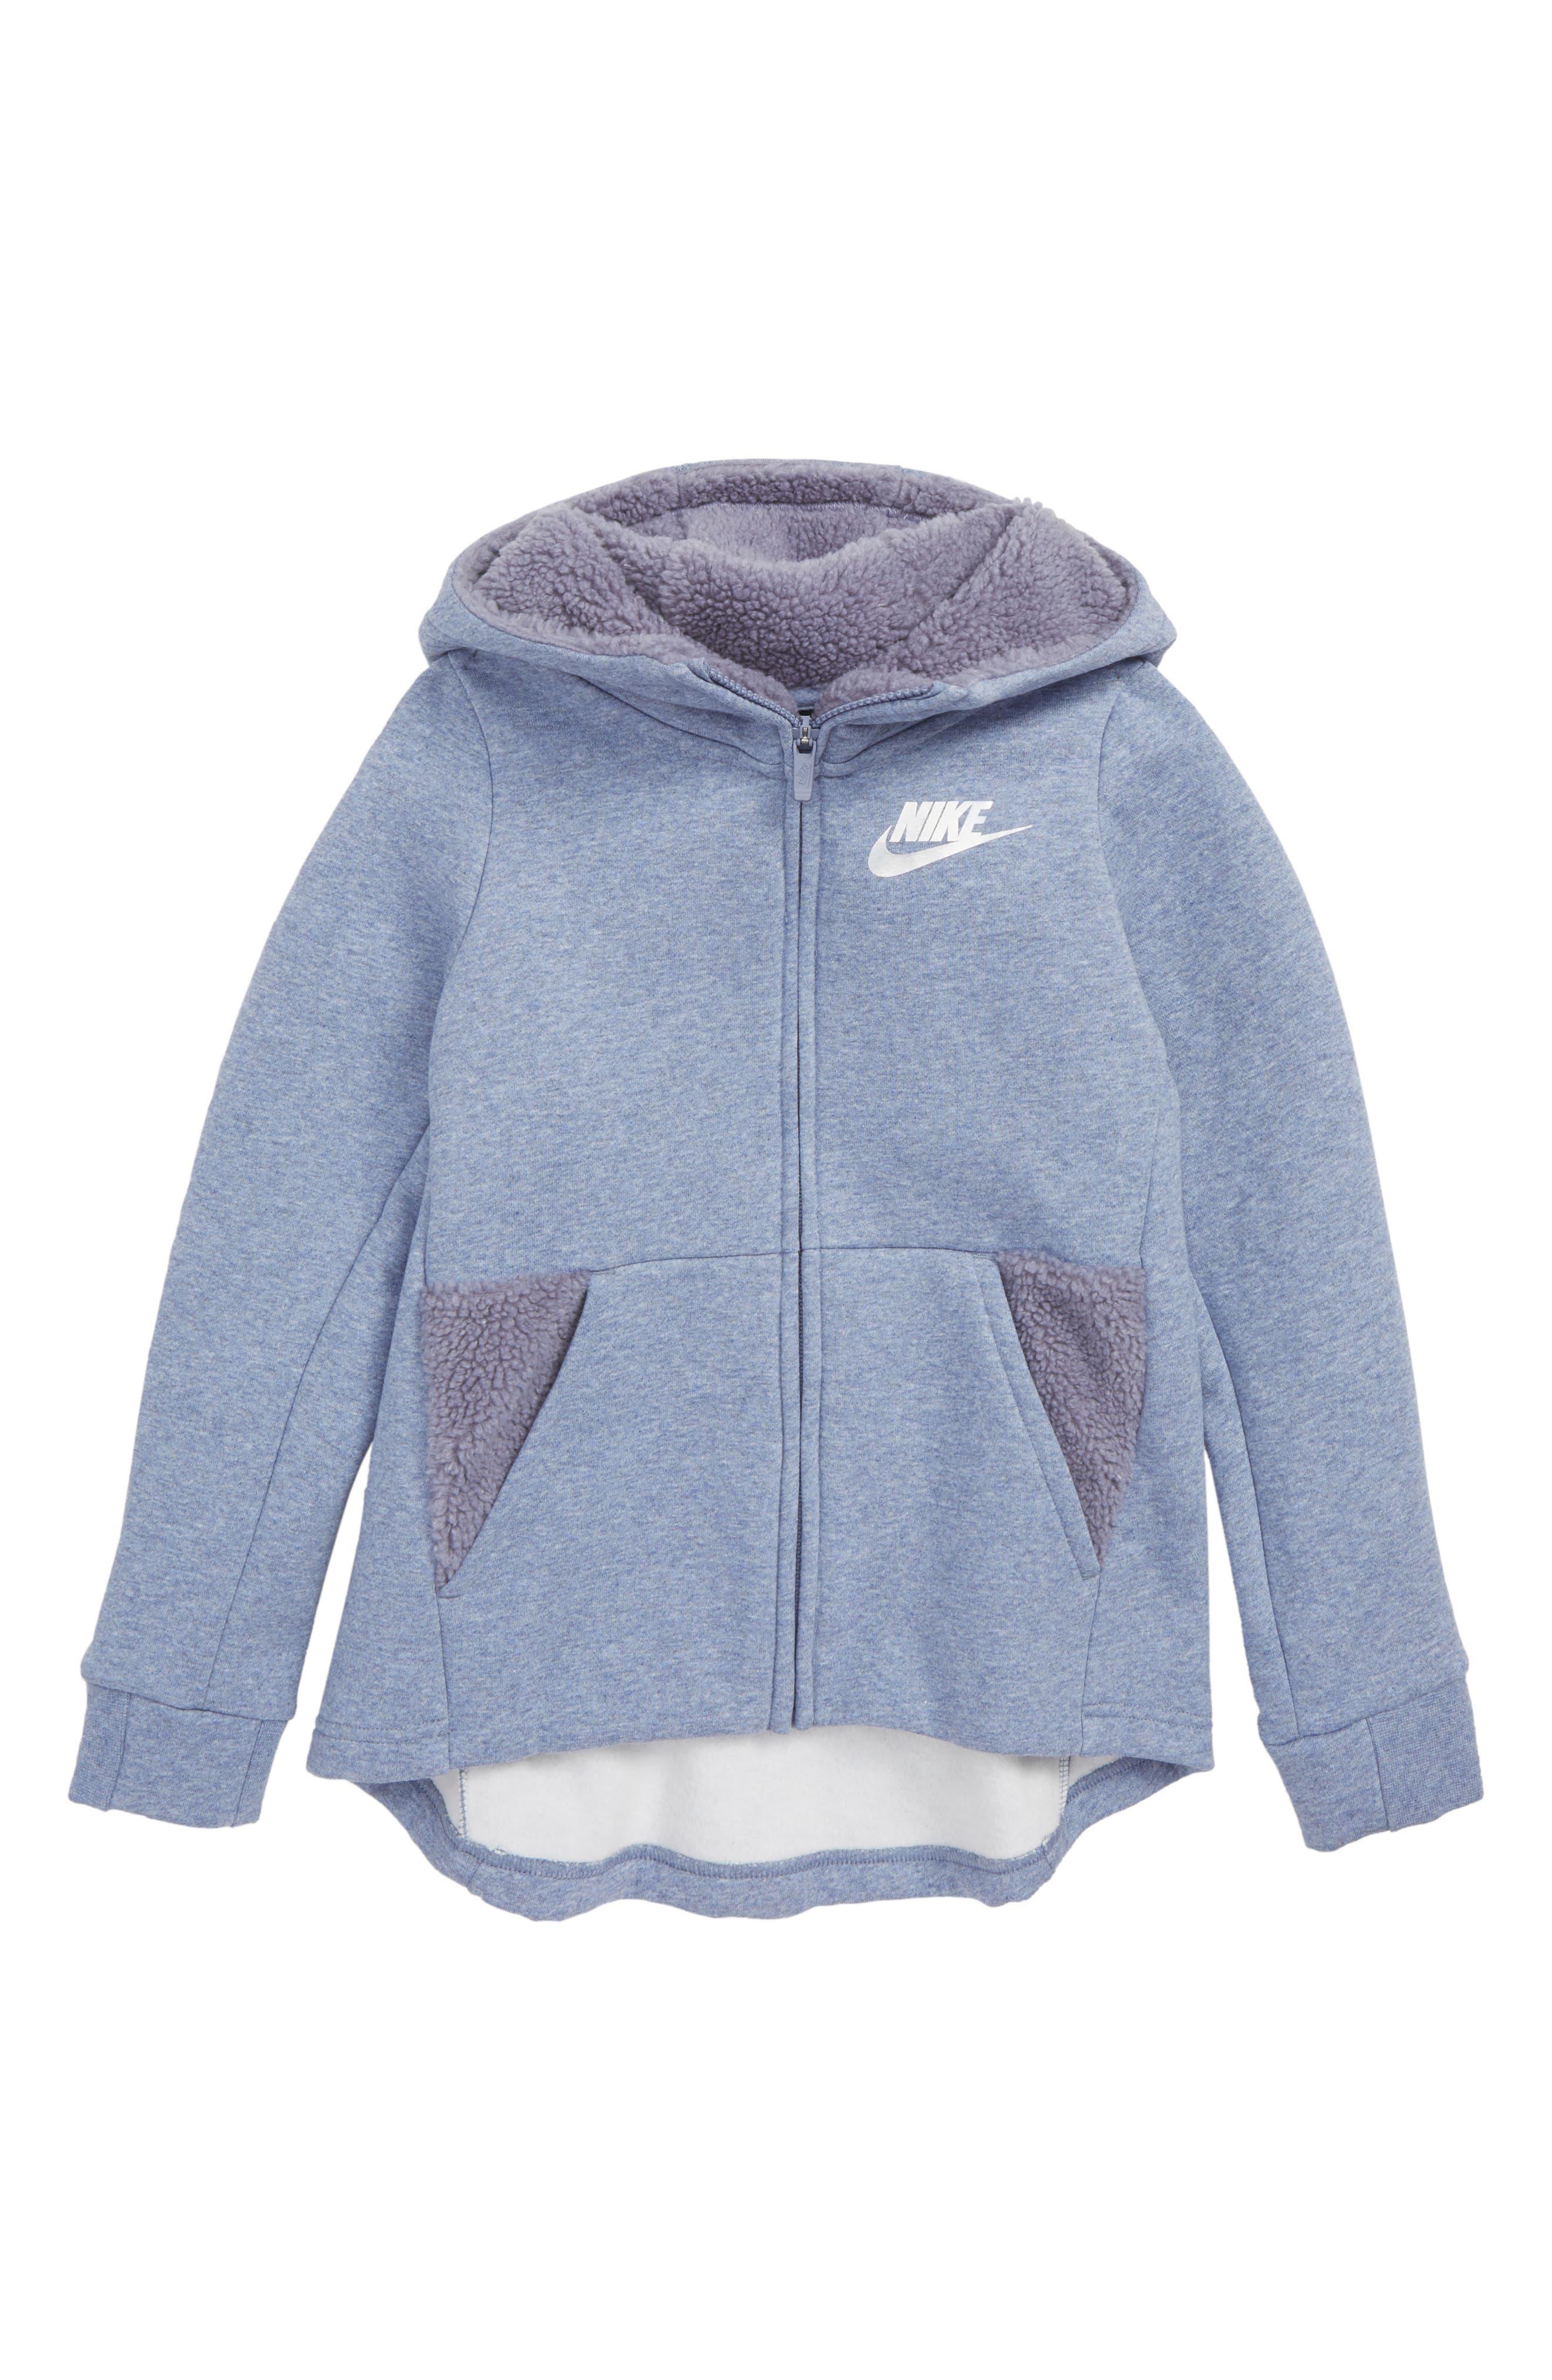 Sportswear Zip Hoodie,                             Main thumbnail 1, color,                             ASHEN SLATE/ HTR